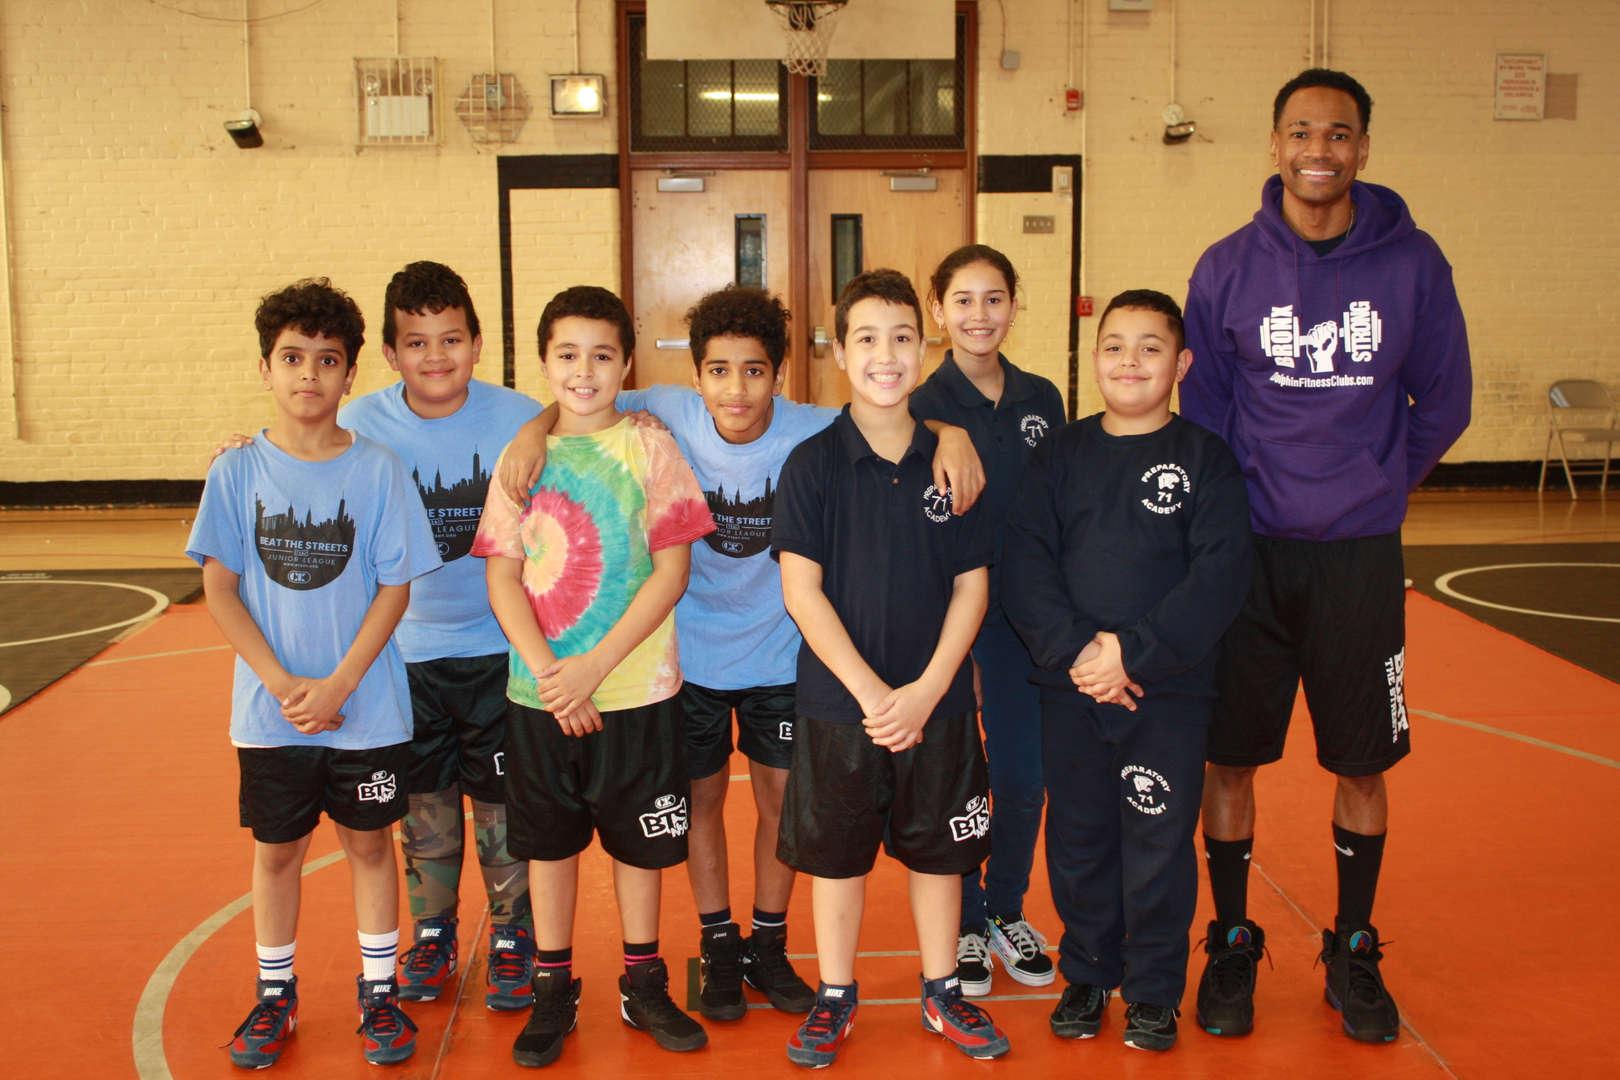 PS 71 Wrestling Team Photo with coach Mr. DeSaque